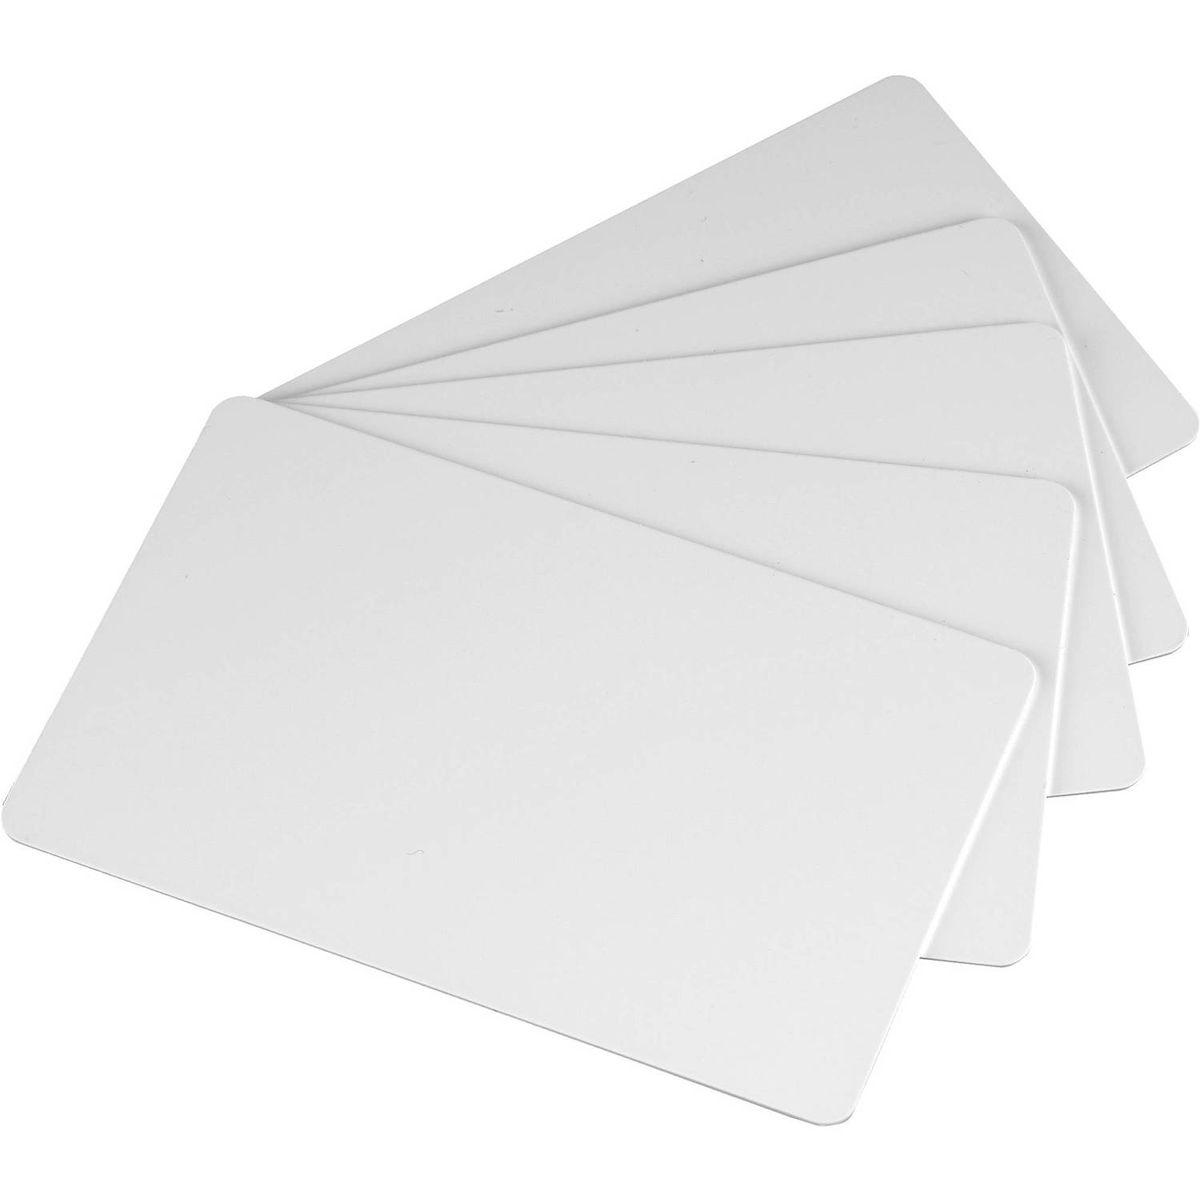 Cards - Hills Australia